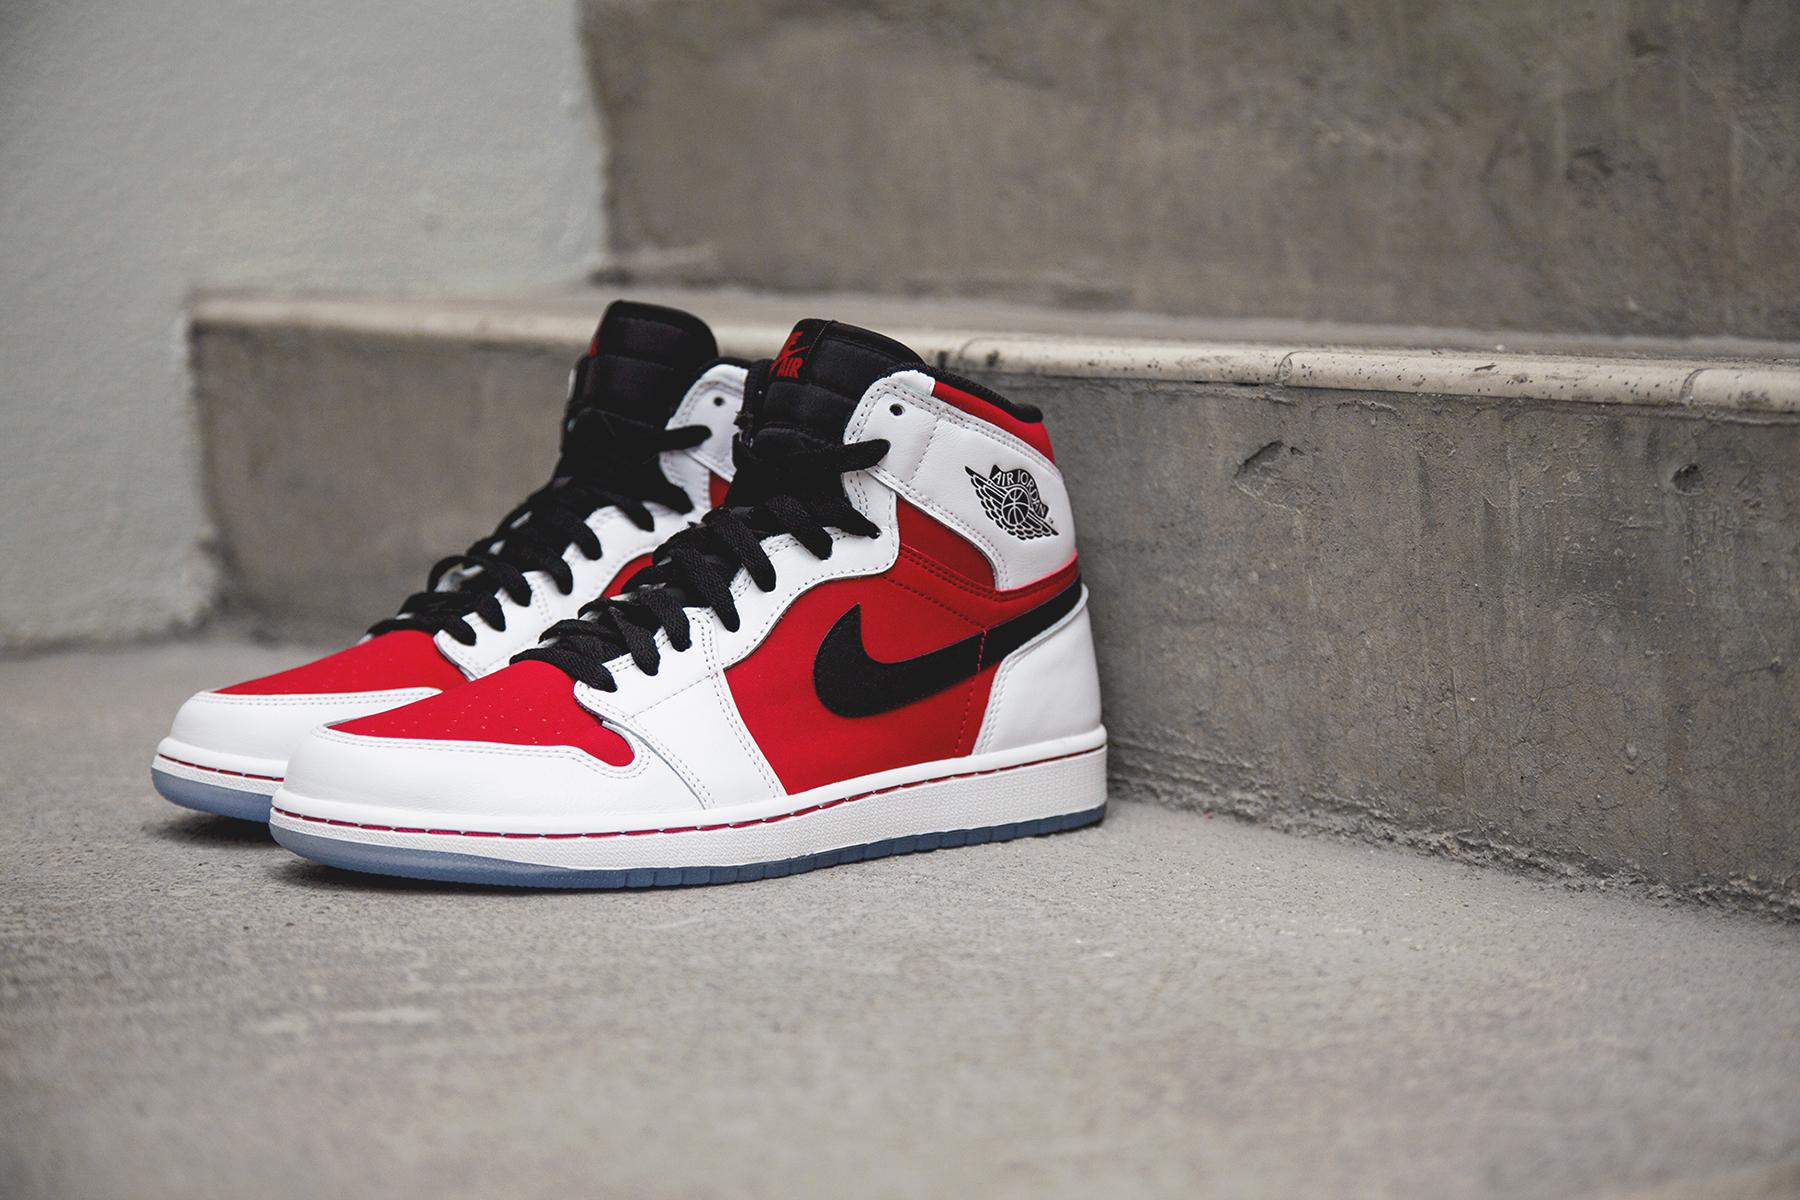 "A Closer Look at the Air Jordan 1 Retro Hi OG ""Carmine"""